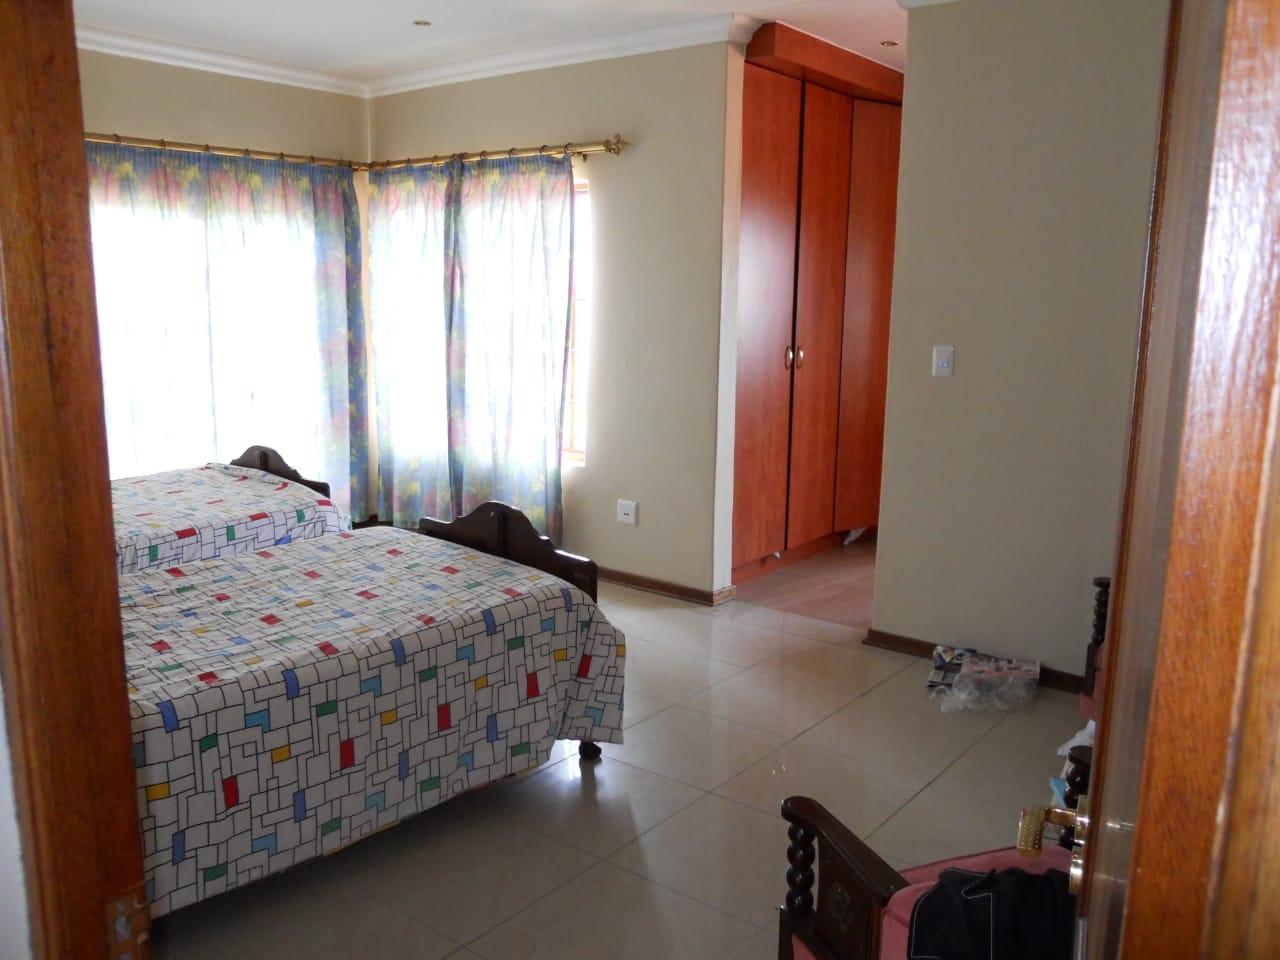 Main bedroom view towards en-suite bathroom